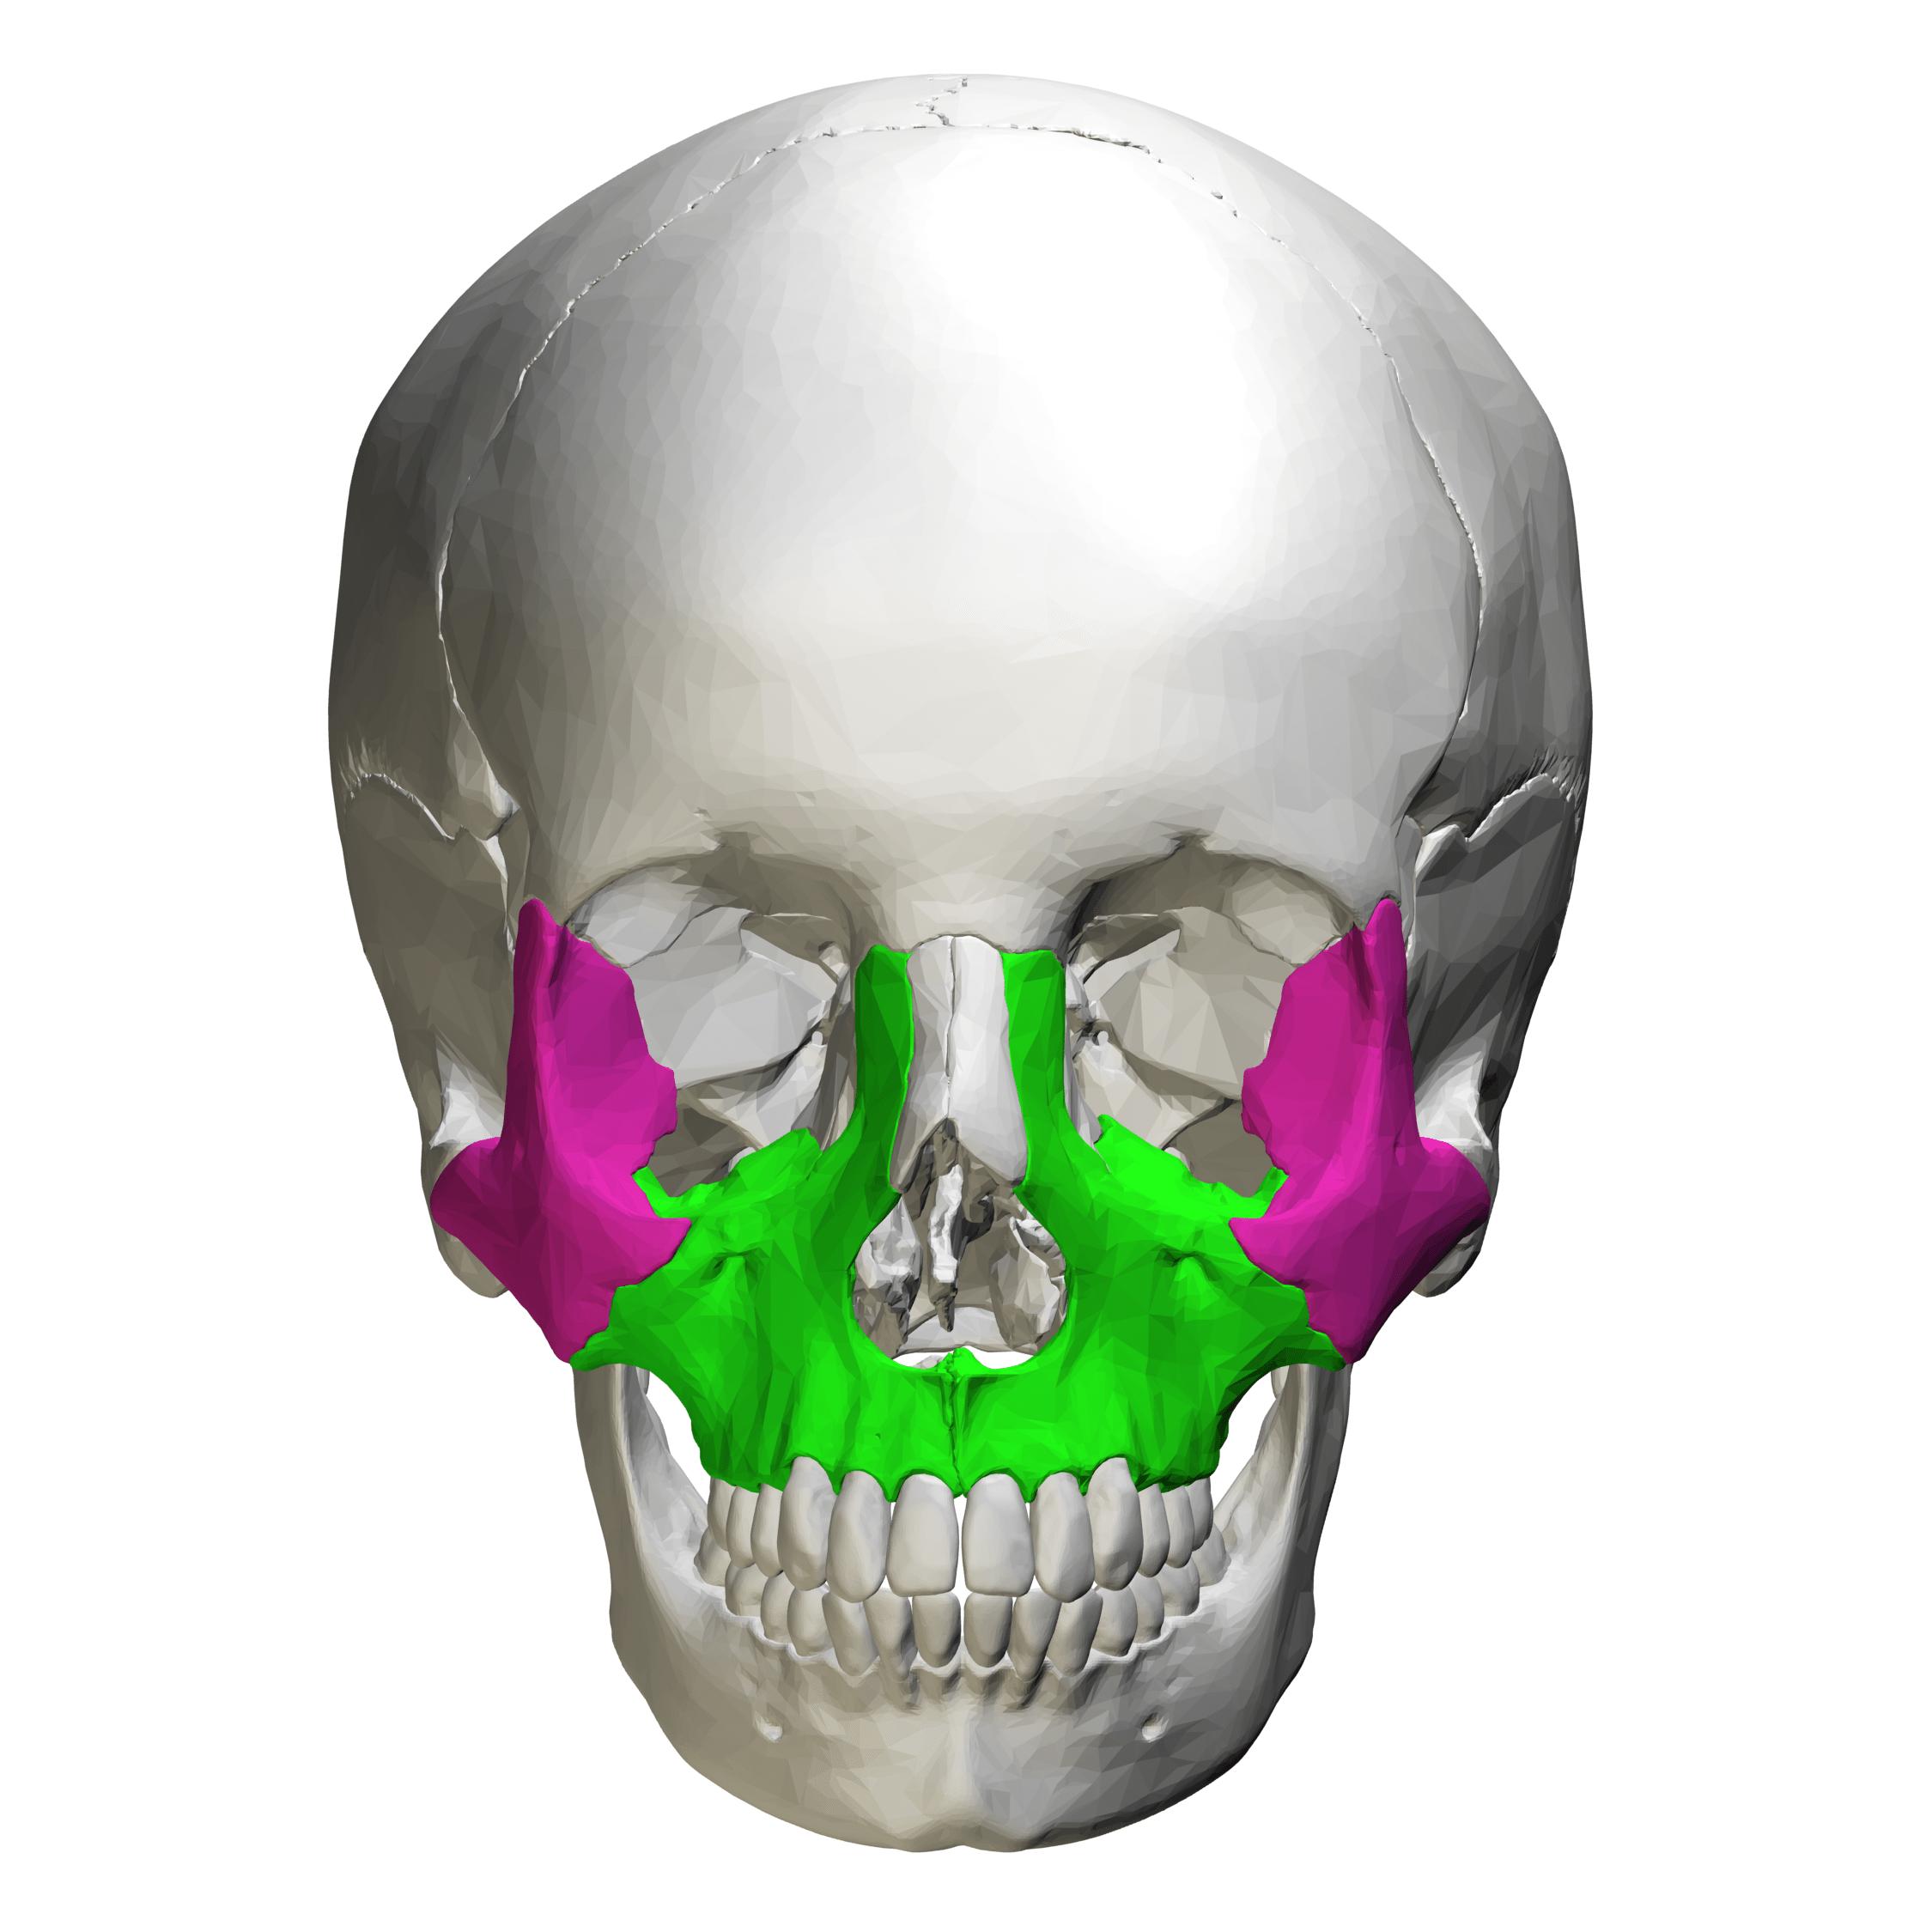 Zygomatic bone anatomy